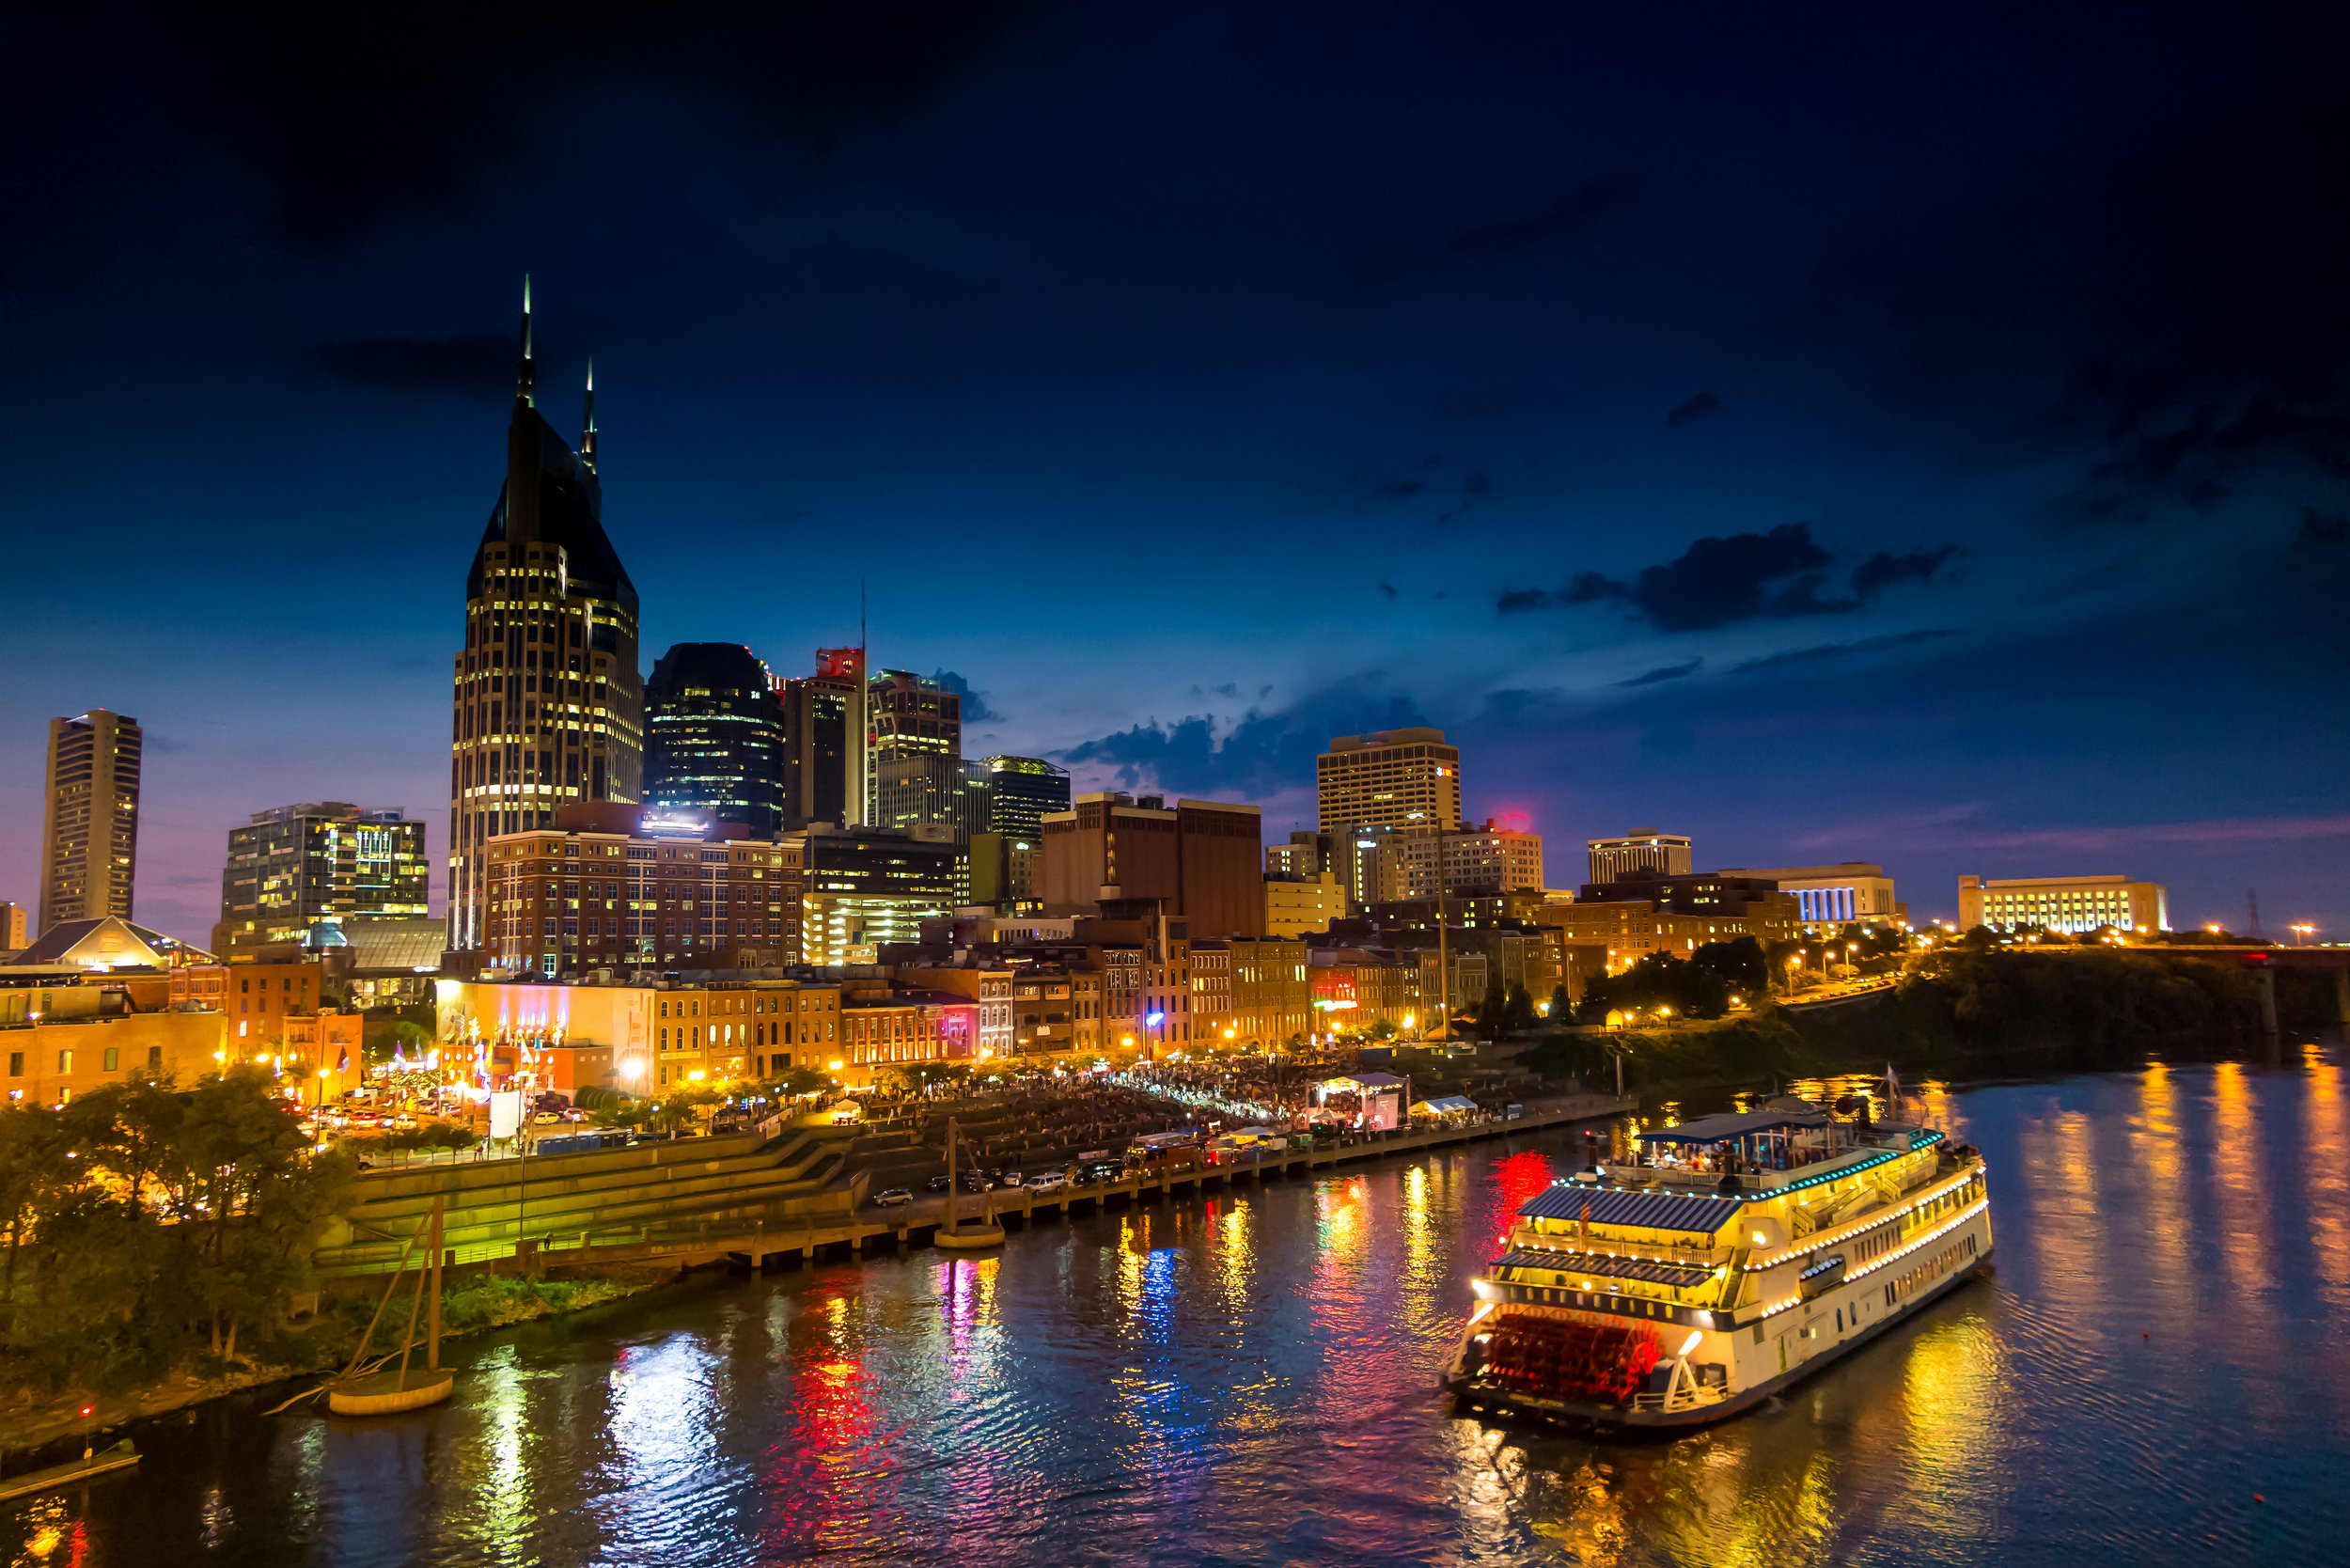 bigstock-Nashville-Tennessee-downtown-s-95566772.jpg